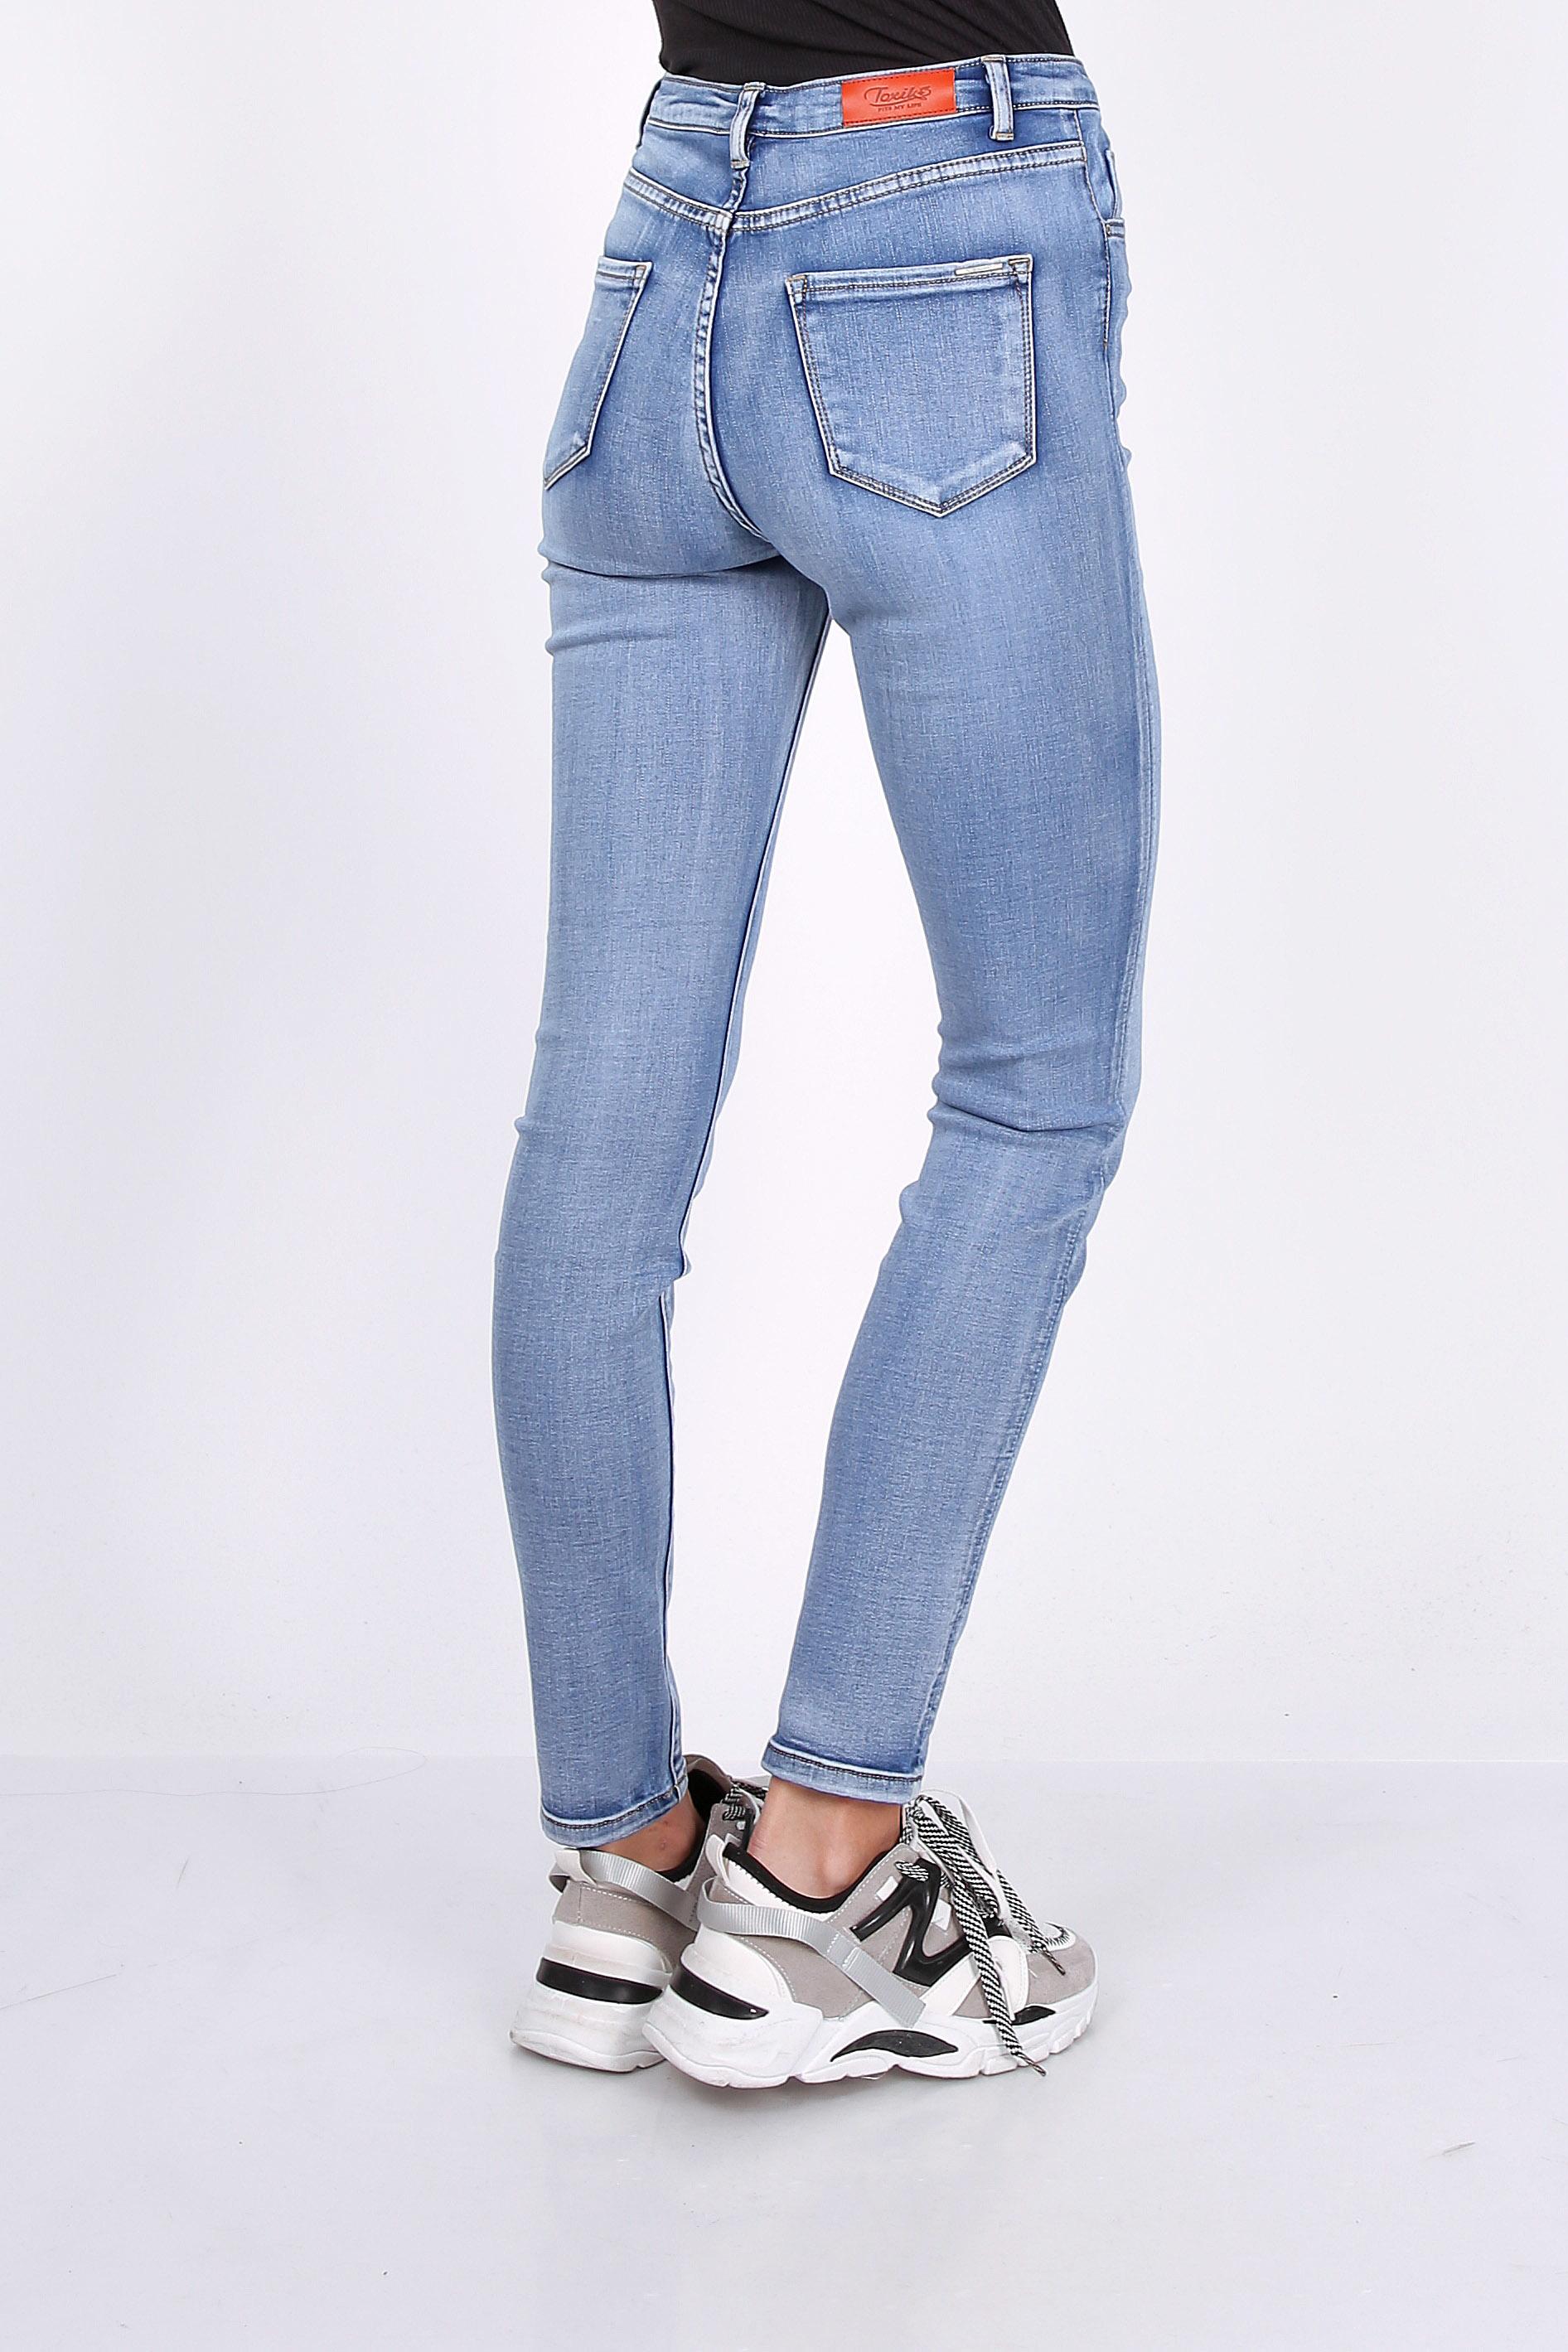 Toxik 3 Jeans | L185-J41 Light Blue Denim High Waisted Super Stretch